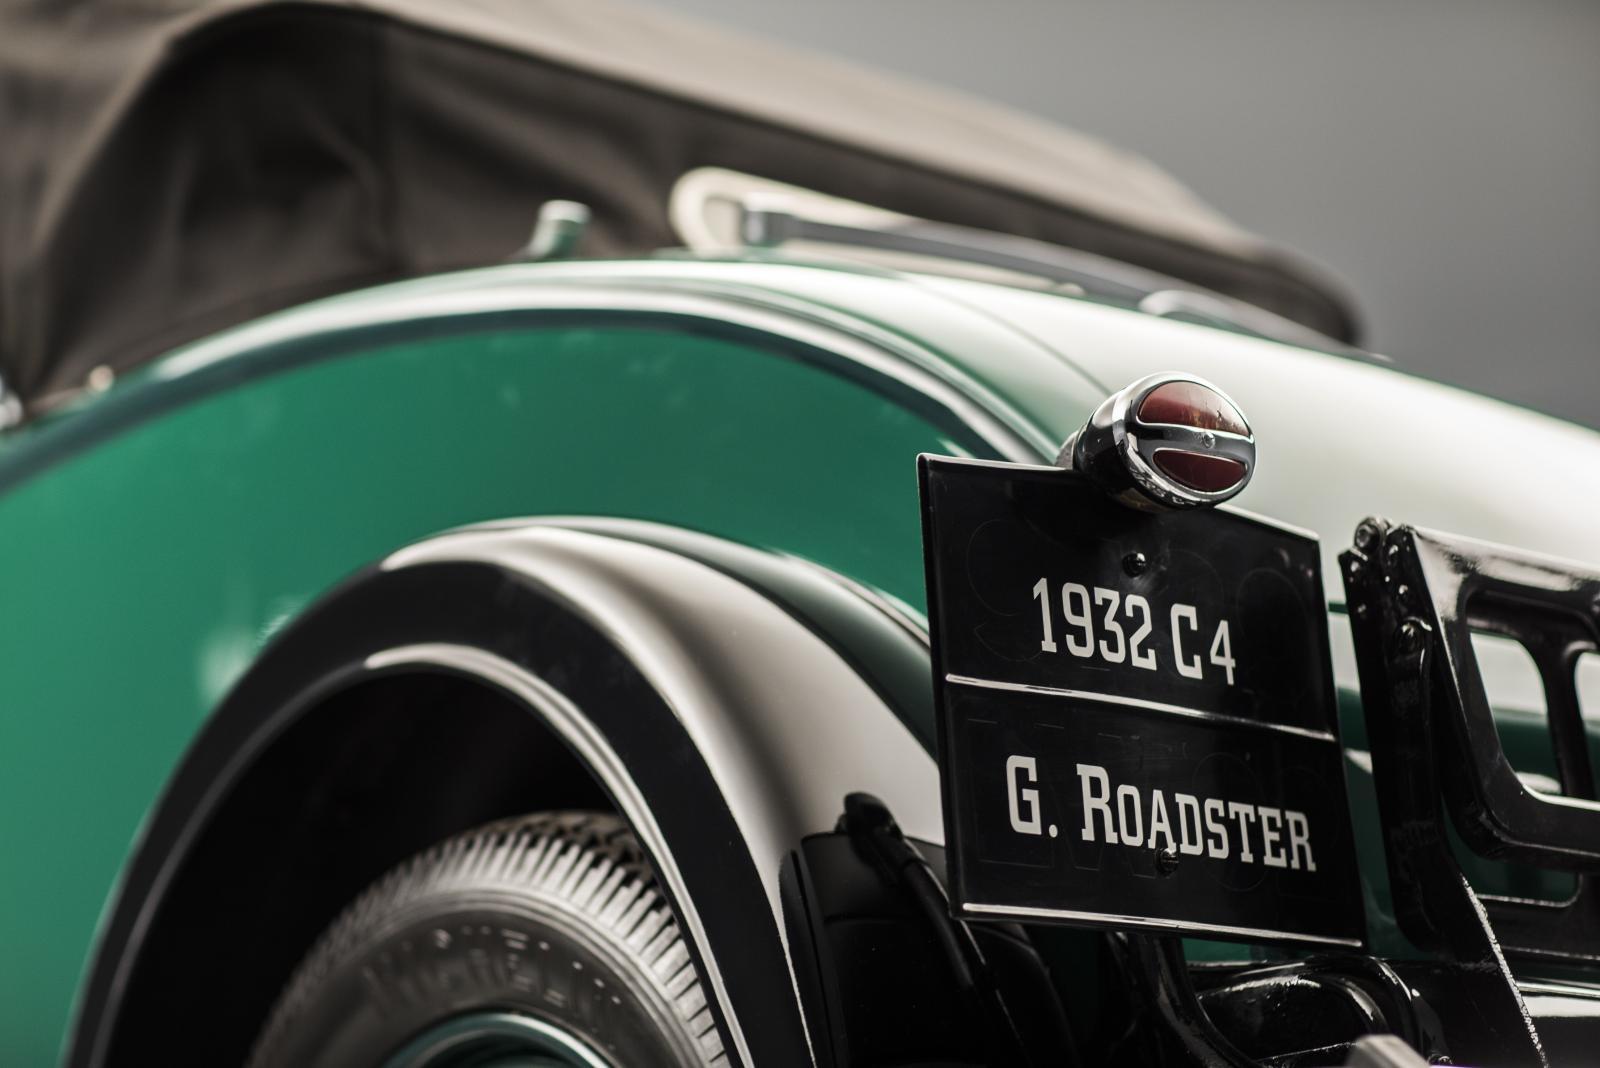 C4G Roadster - 3/4 arrière